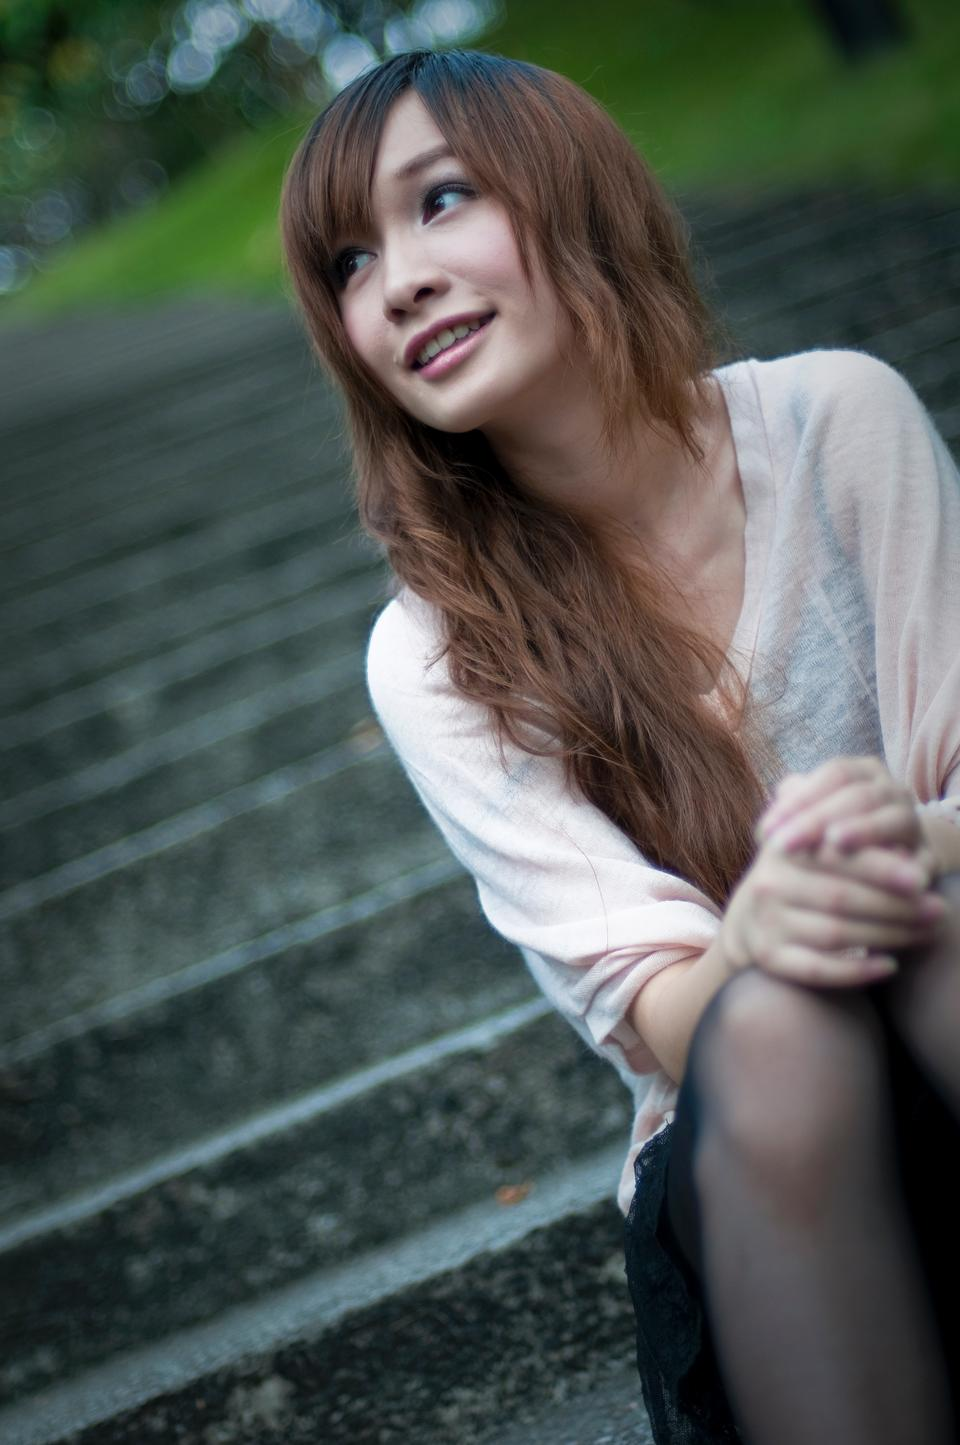 Free Cute Girl Sitting On Steps Outside